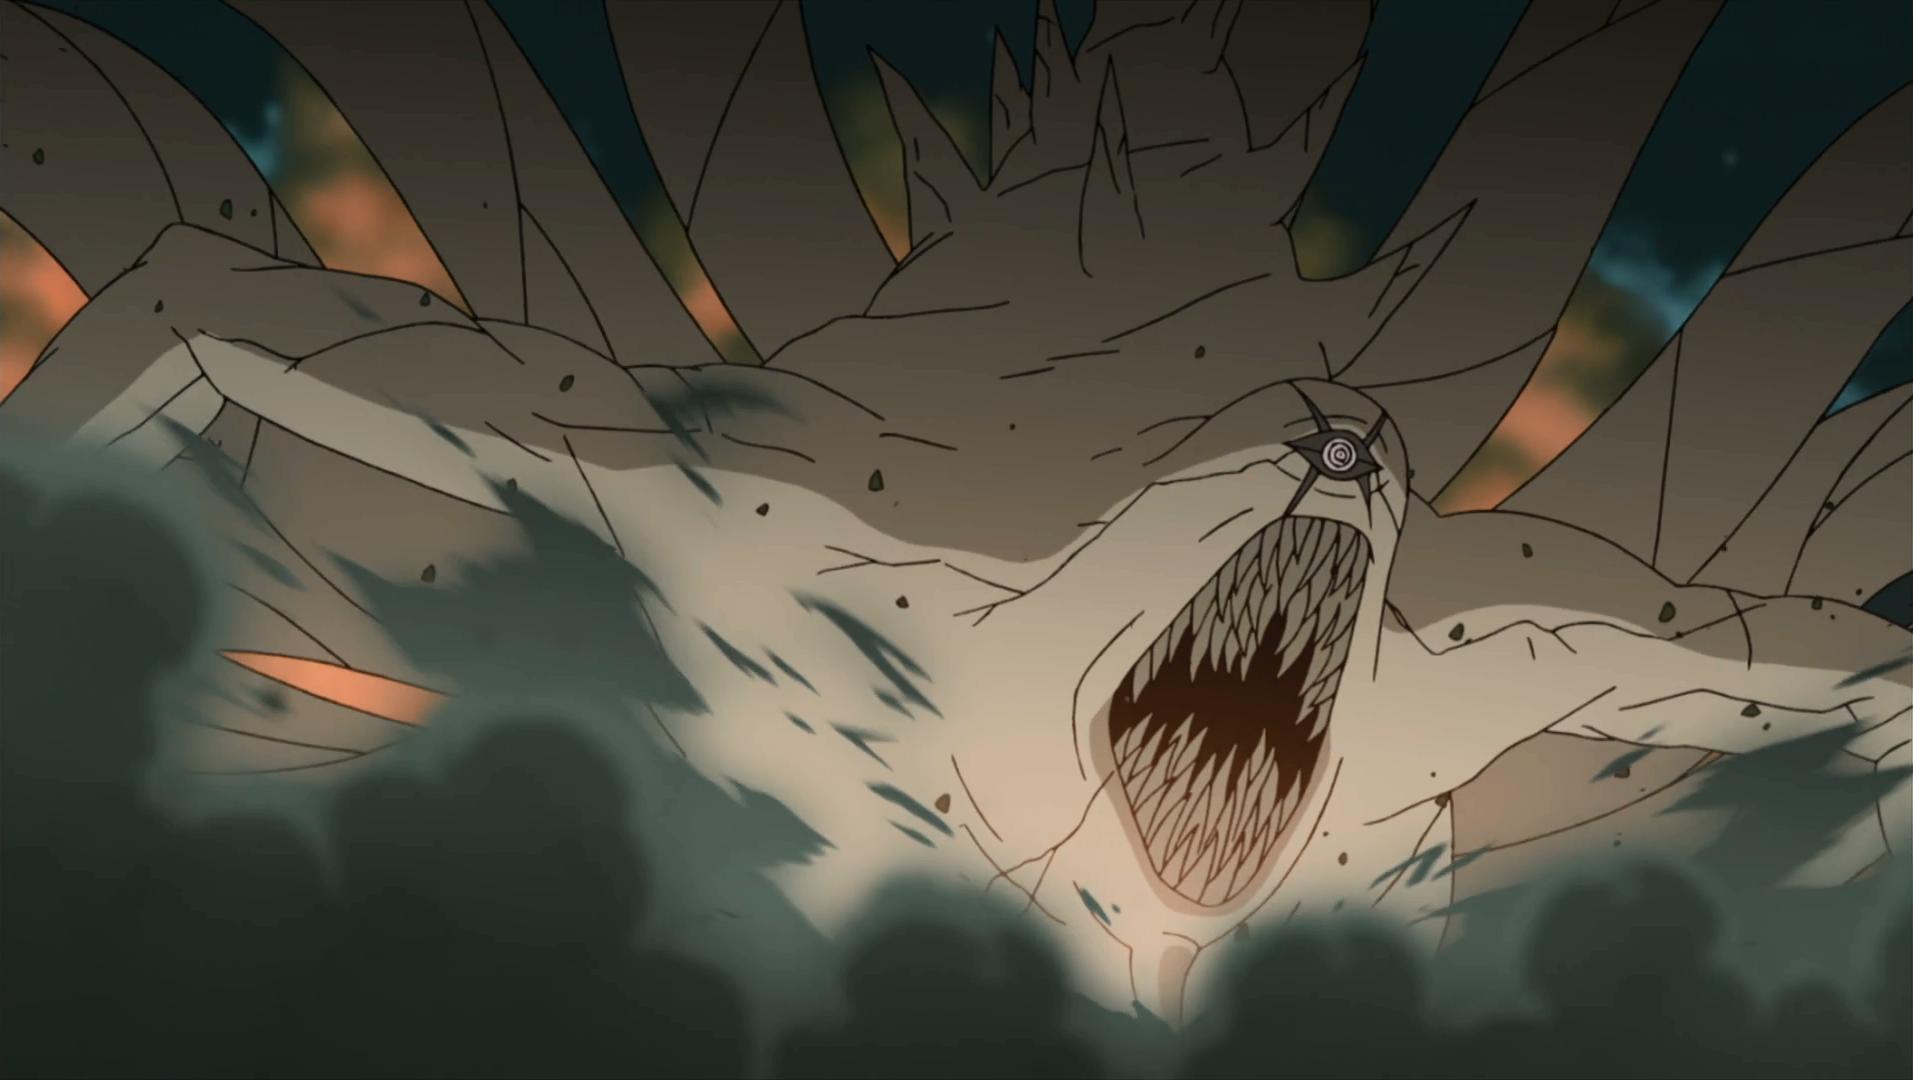 Ten-Tails | Narutopedia | FANDOM powered by Wikia